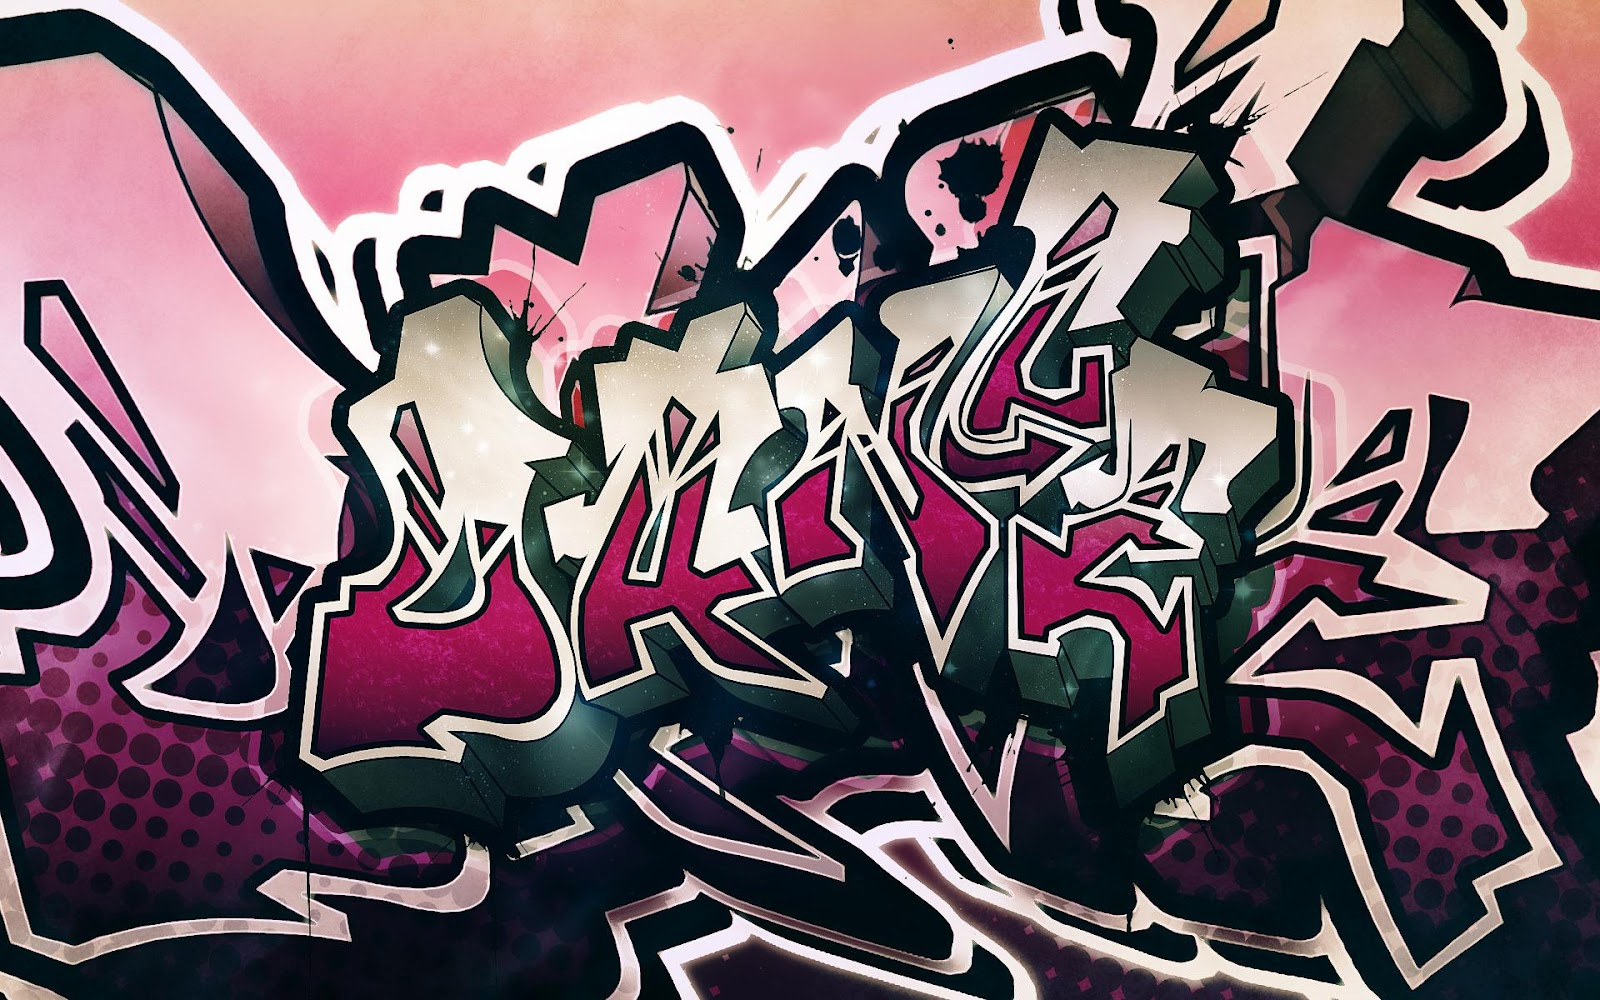 3d Rajan Name Wallpaper Free High Definition Wallpapers Colorful Graffiti